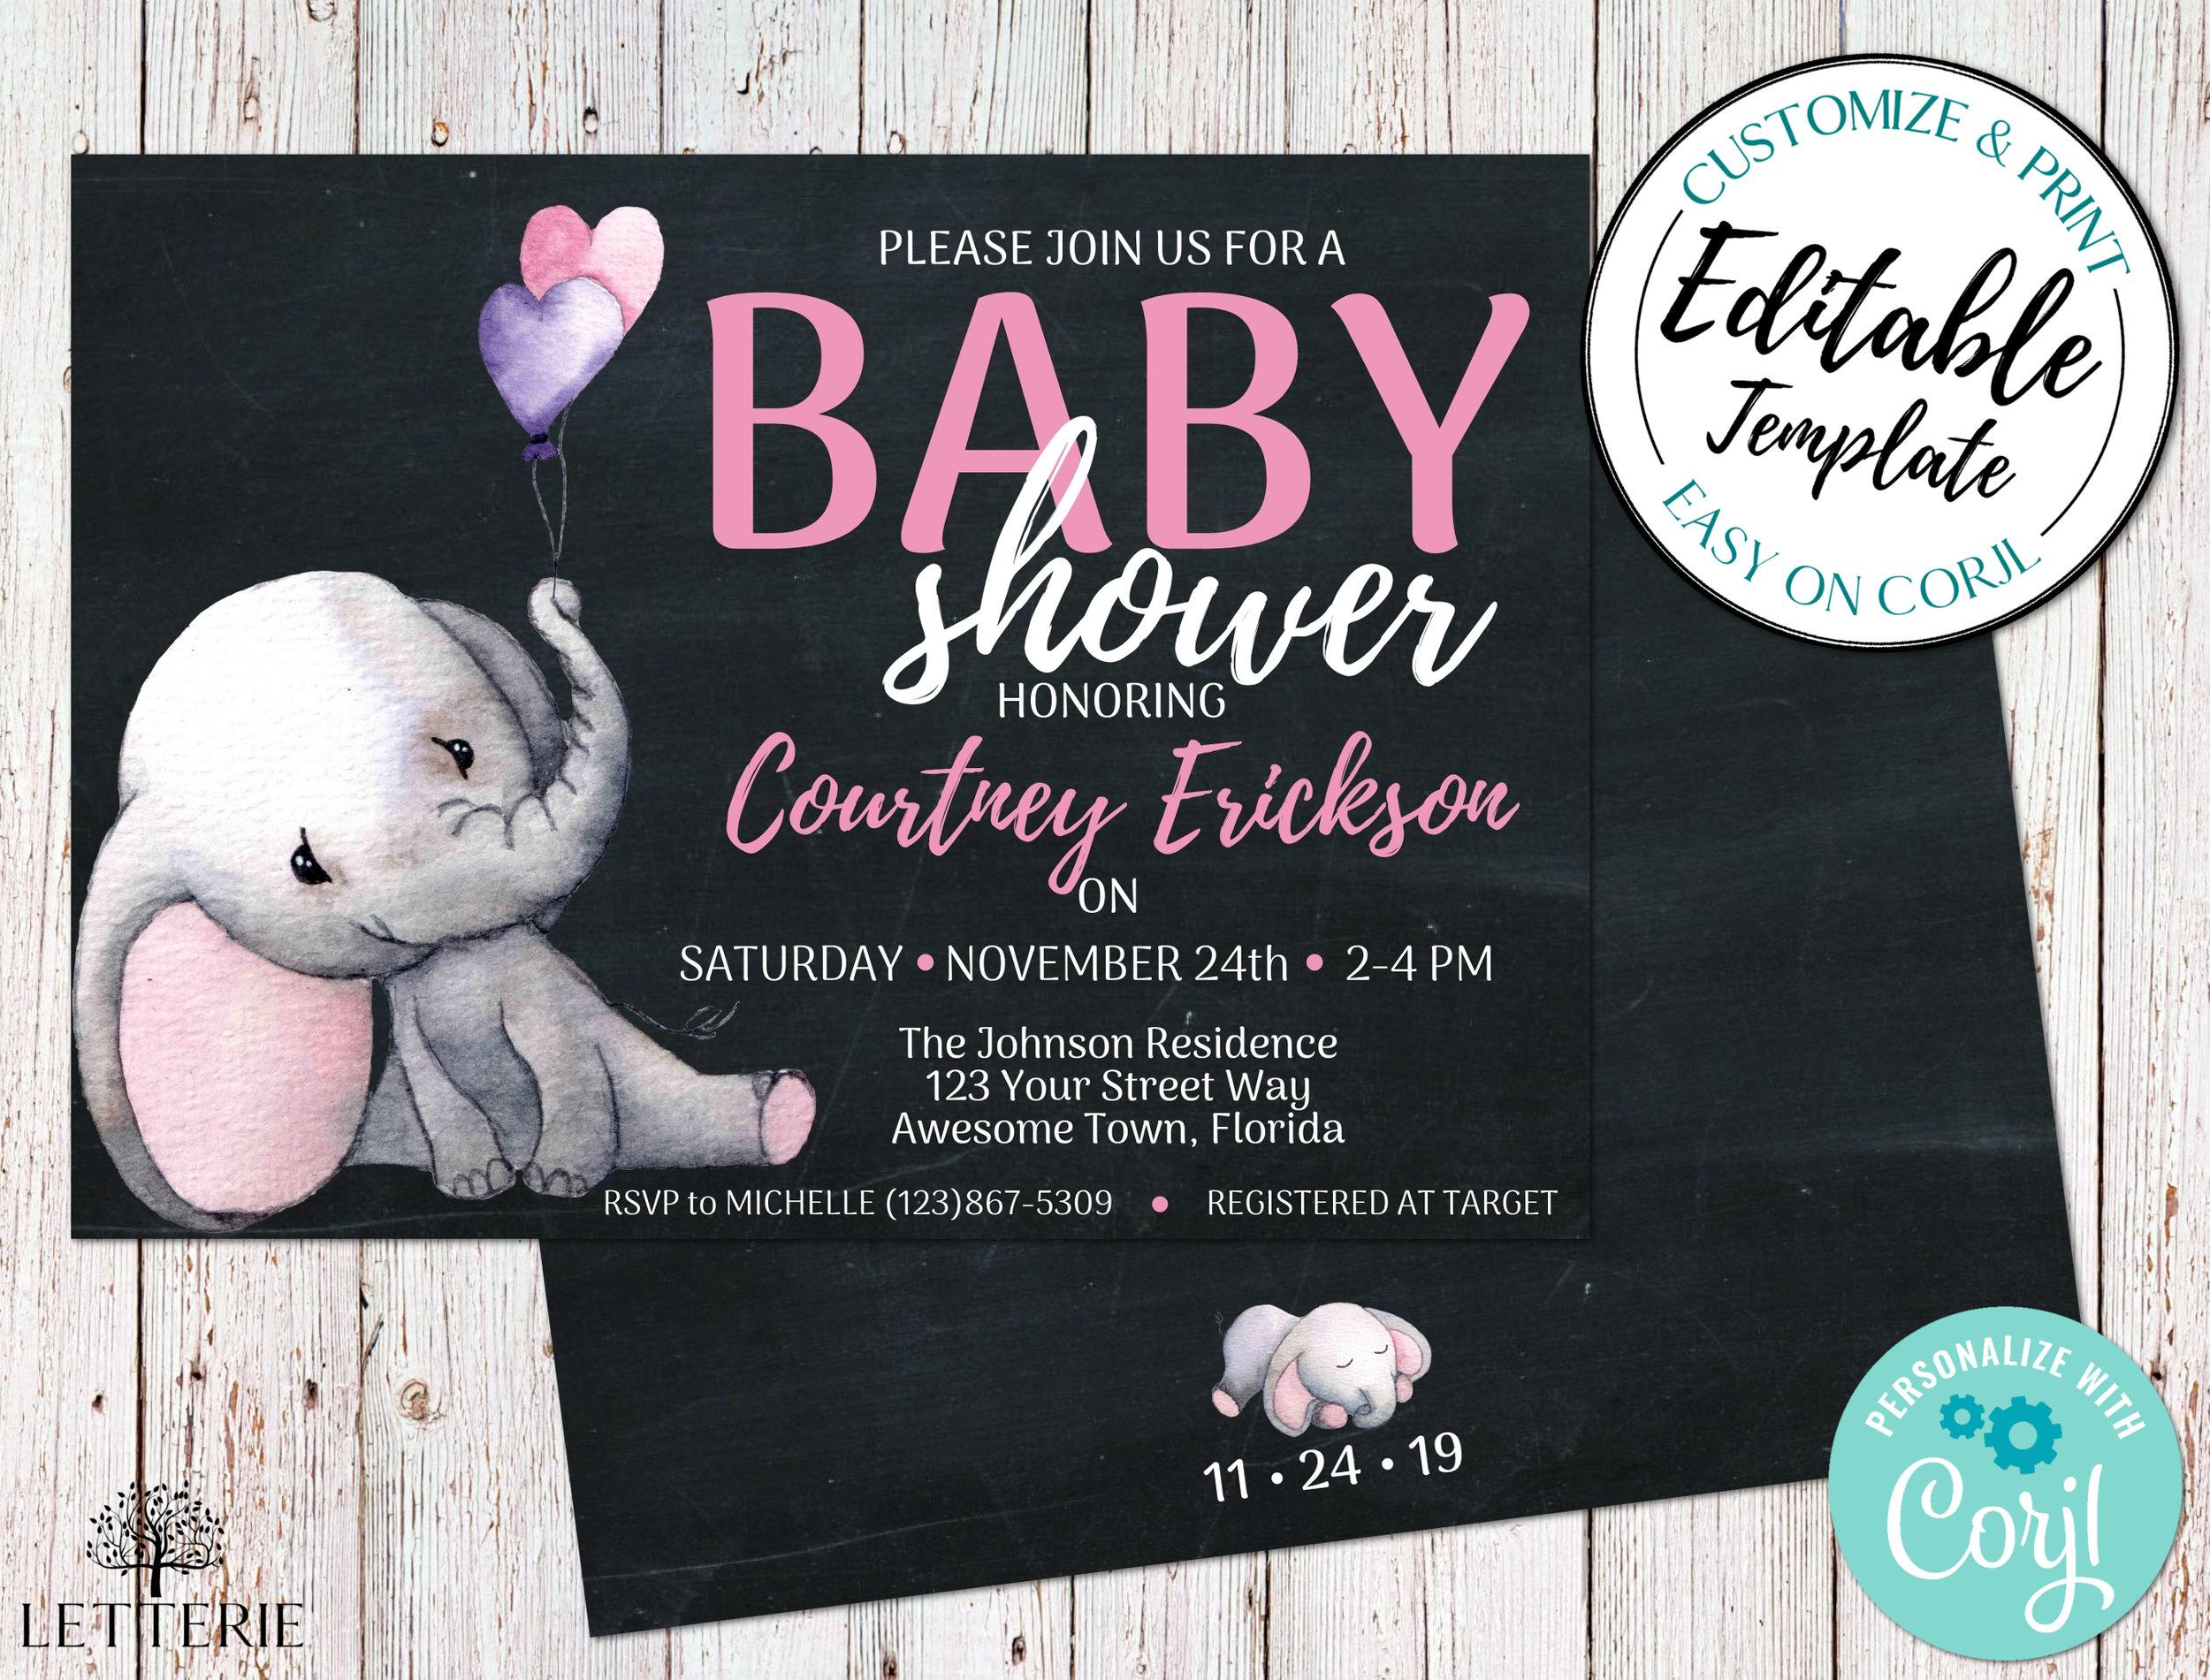 Elephant_BabyShower_Girl_Chalkboard_Invitation_Mockup.jpeg